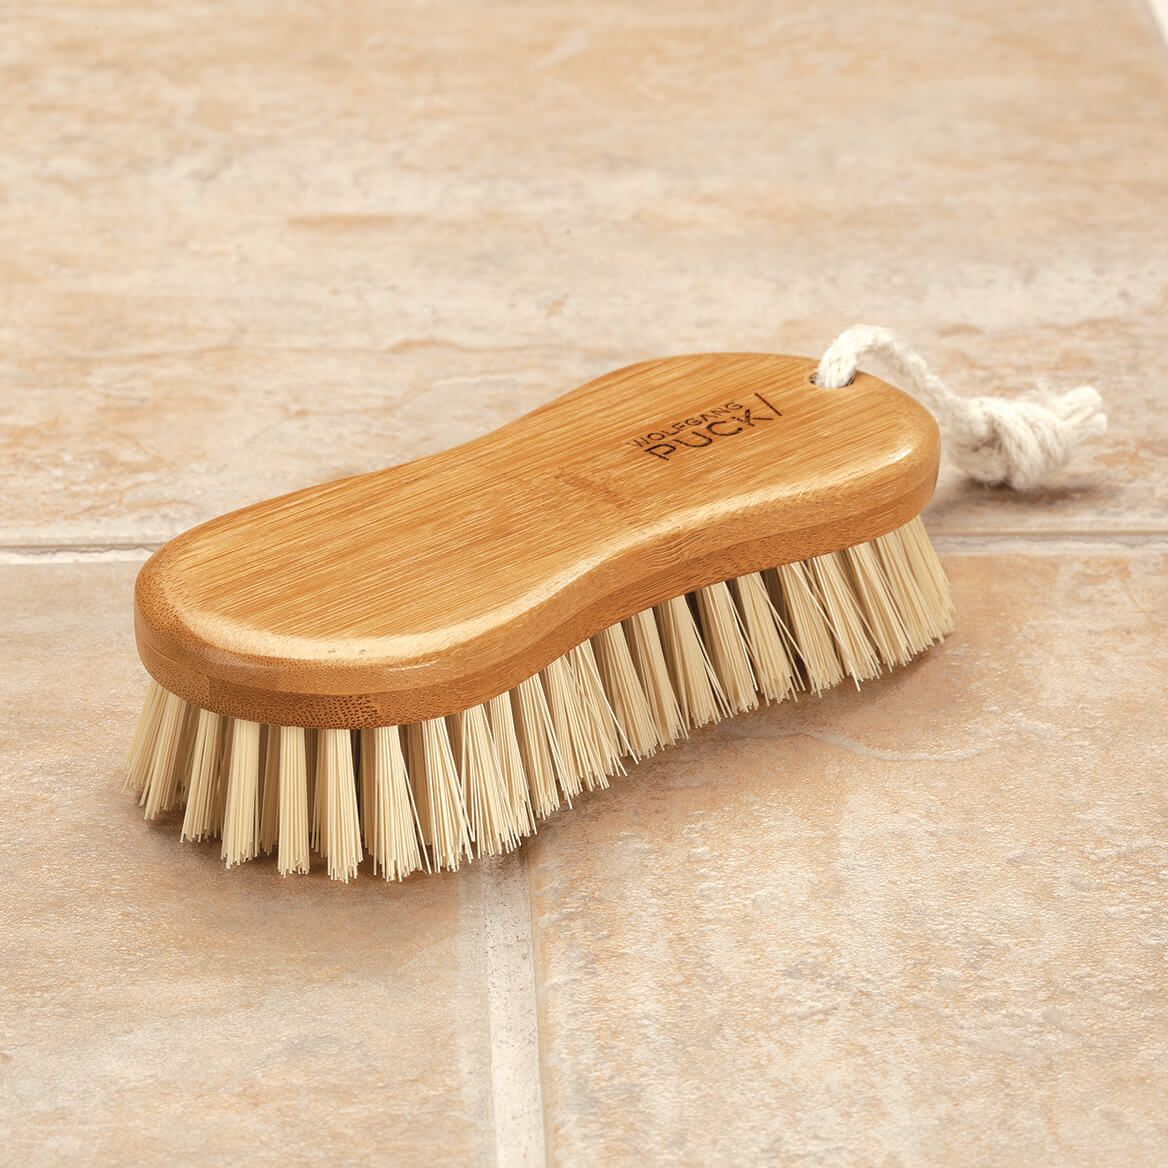 Wolfgang Puck Bamboo Floor Brush-371102